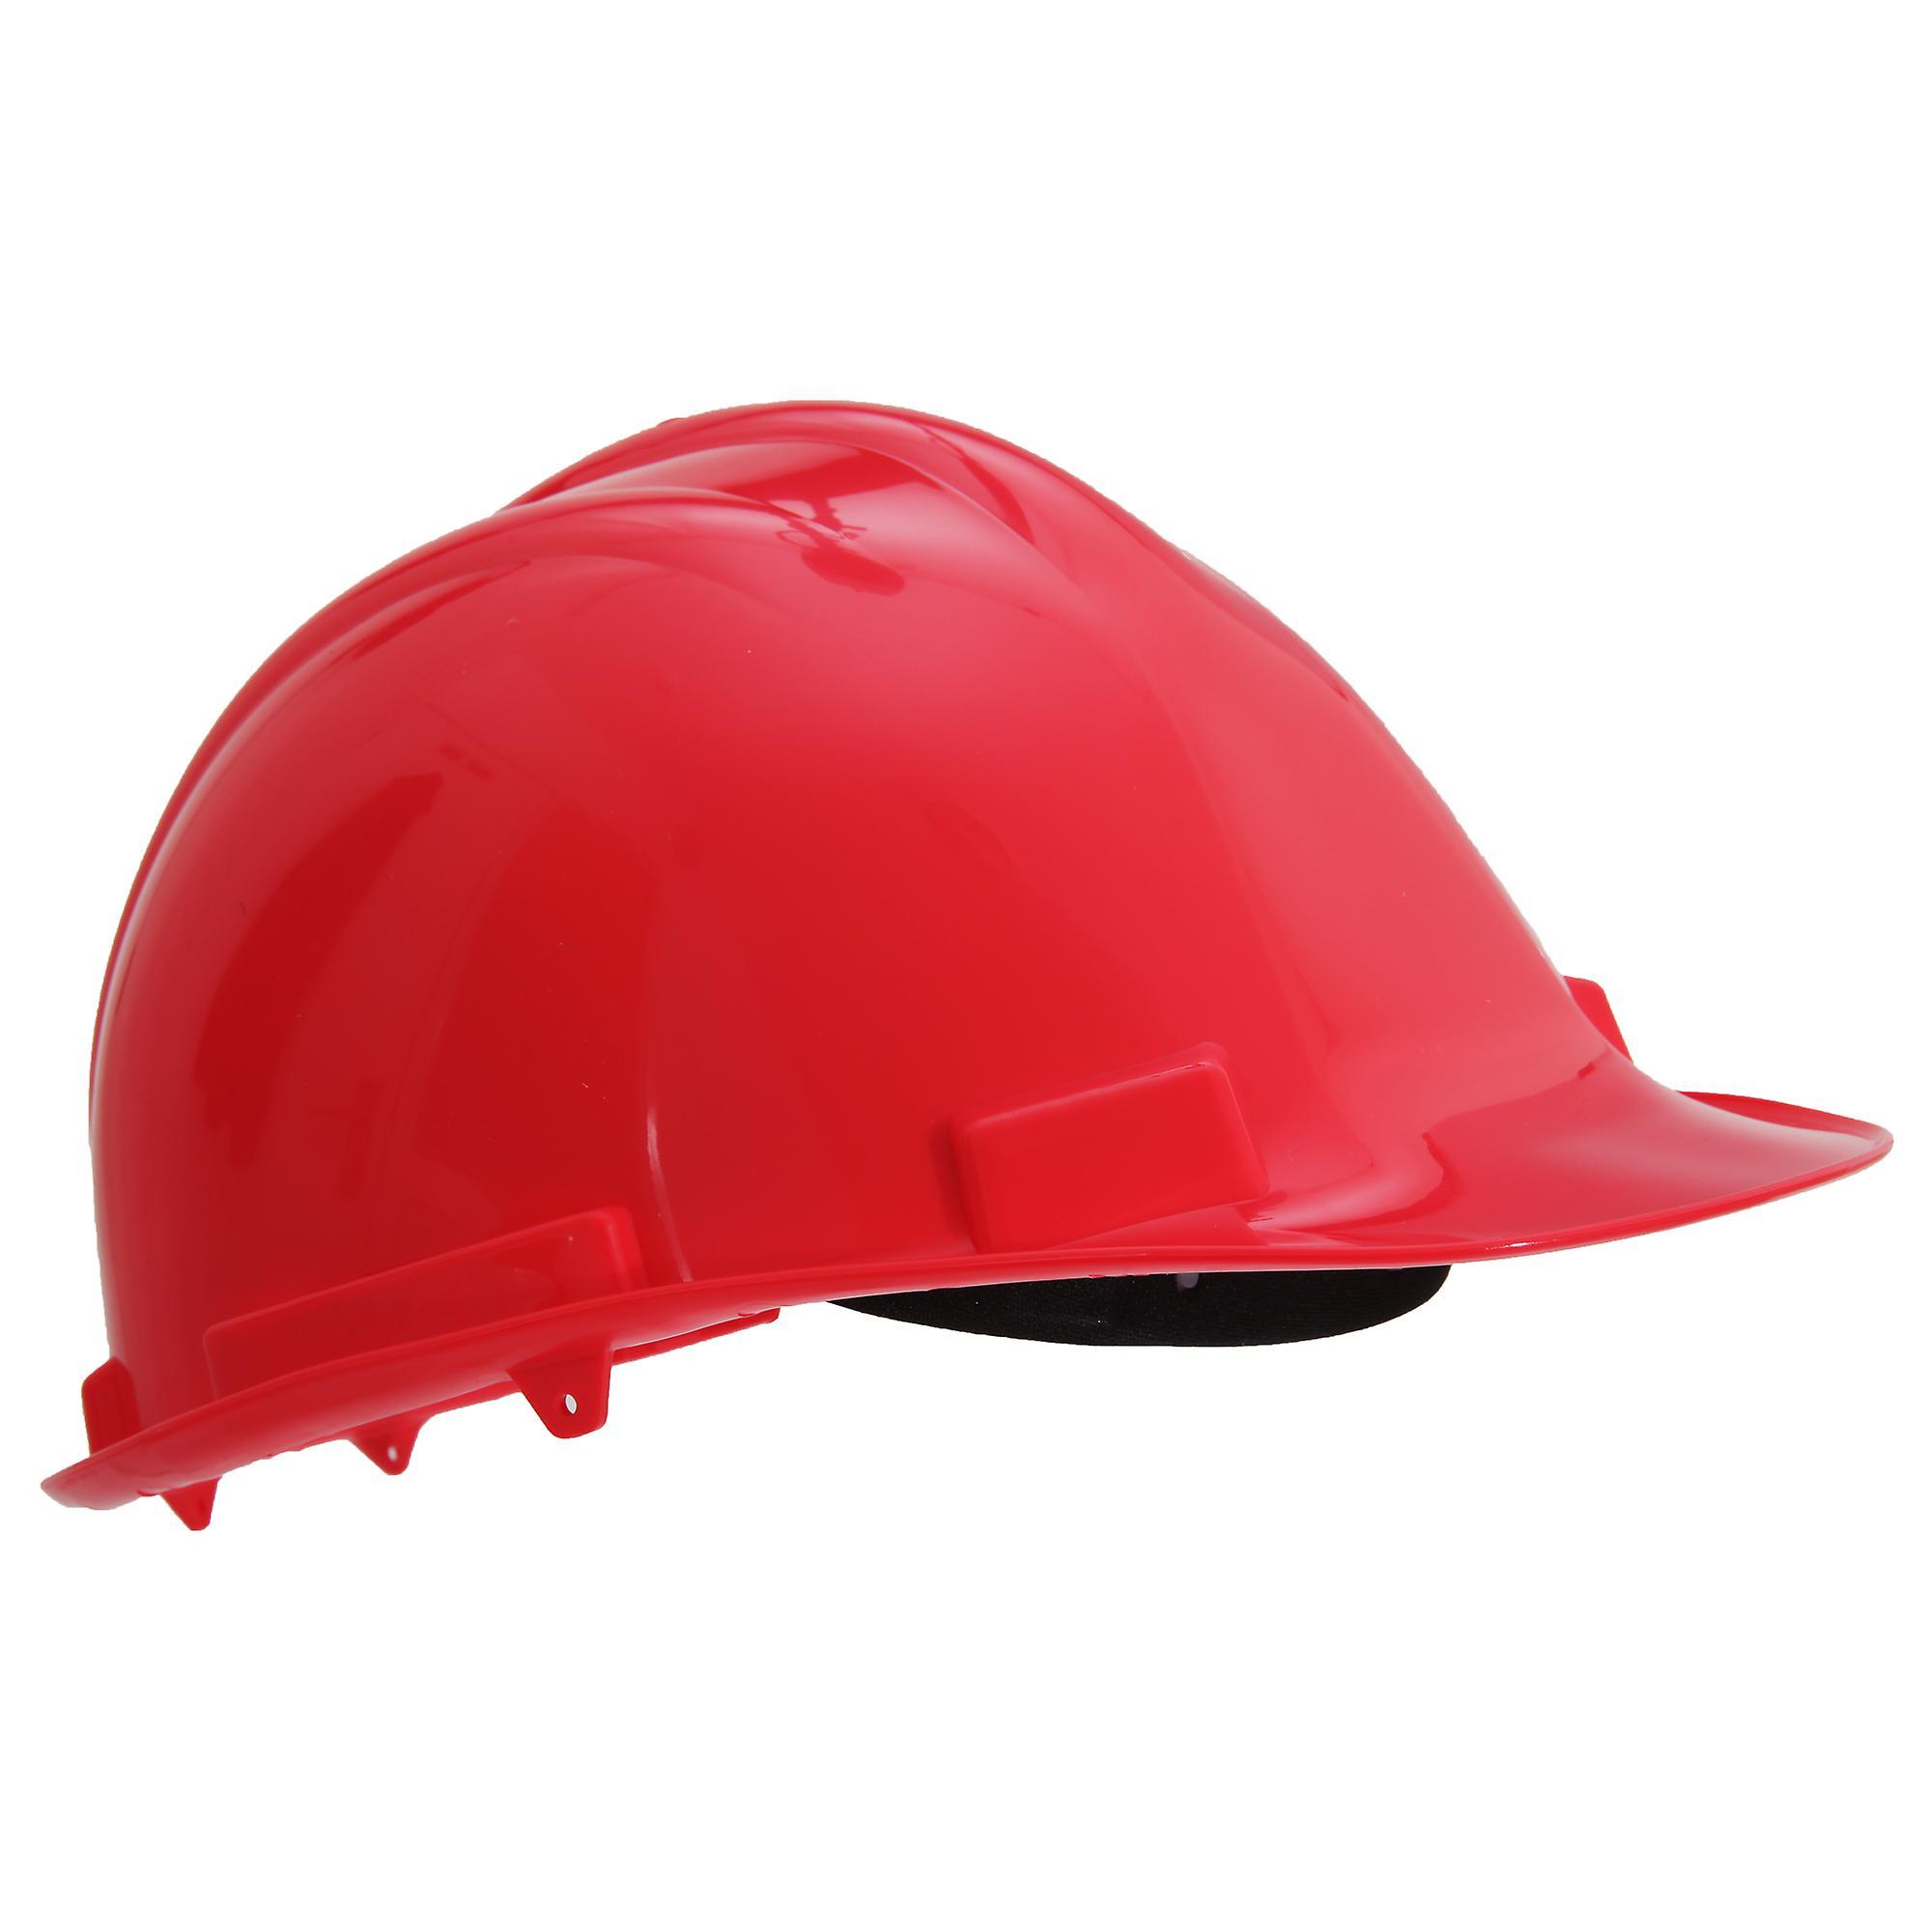 Portwest Endurance Headwear Safety Helmet – PP (PW50) / Safetywear